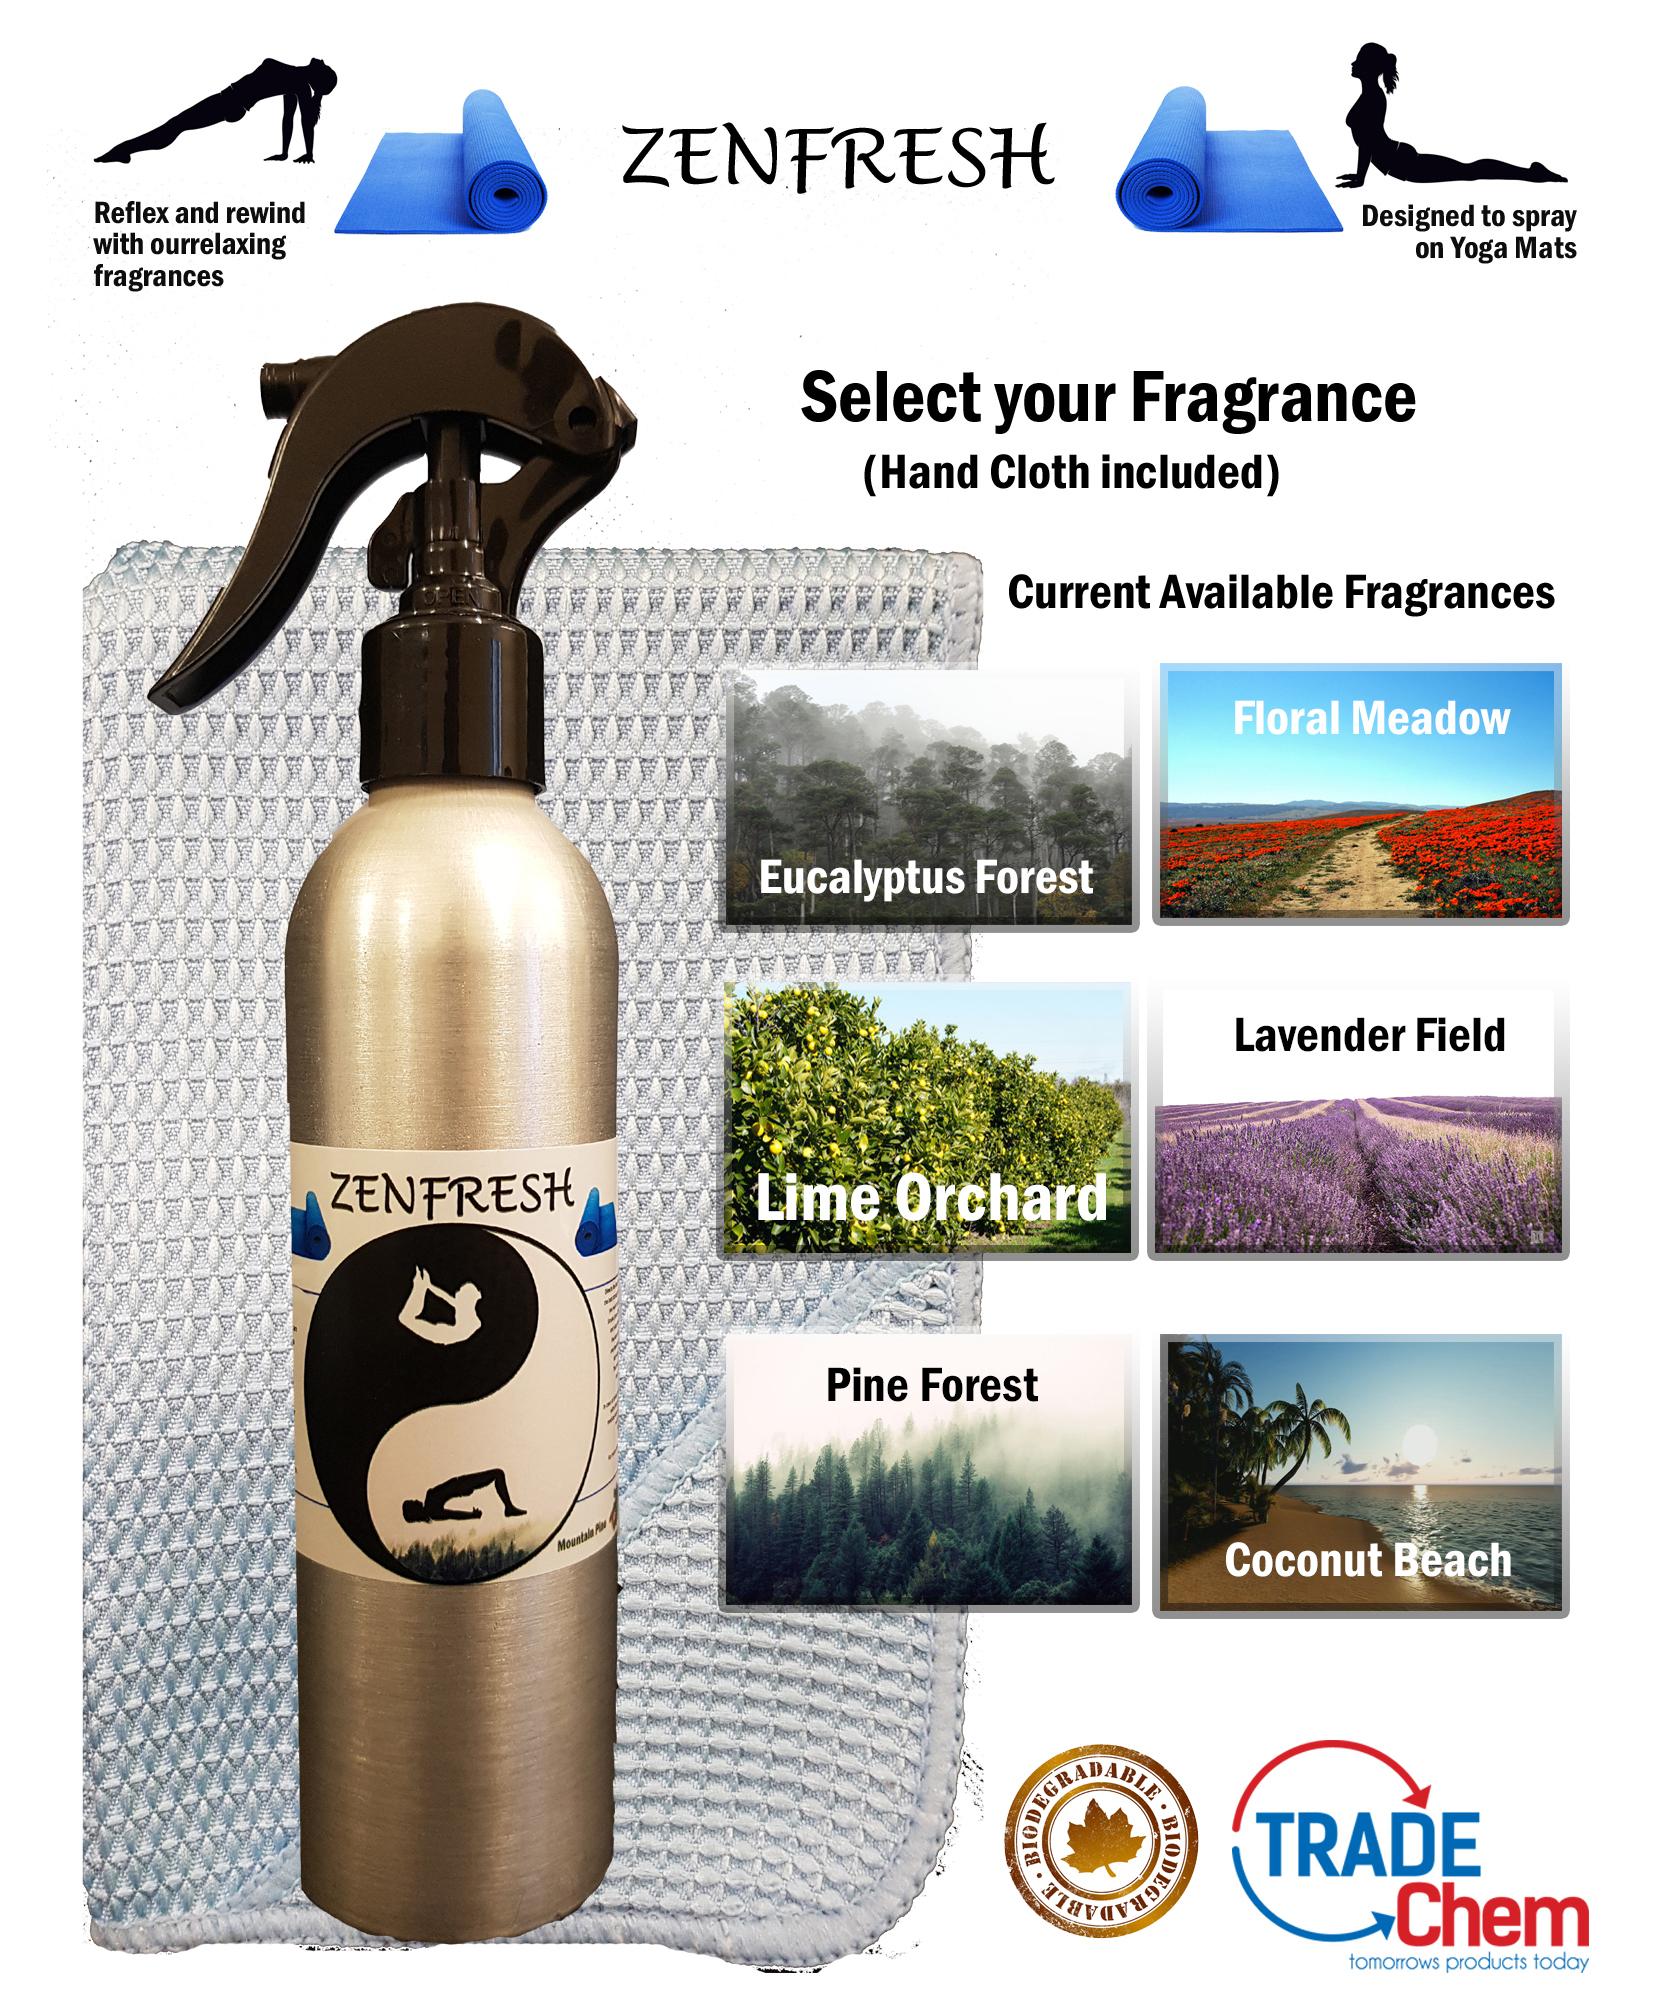 products-ZenFresh-Advertiser